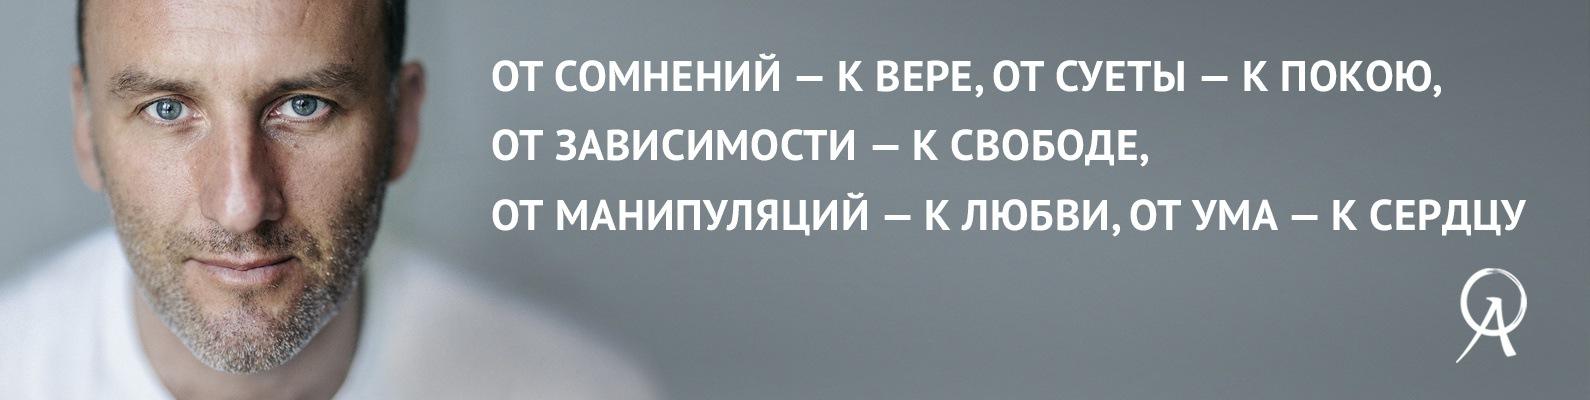 Андрей алексеев в контакте [PUNIQRANDLINE-(au-dating-names.txt) 25